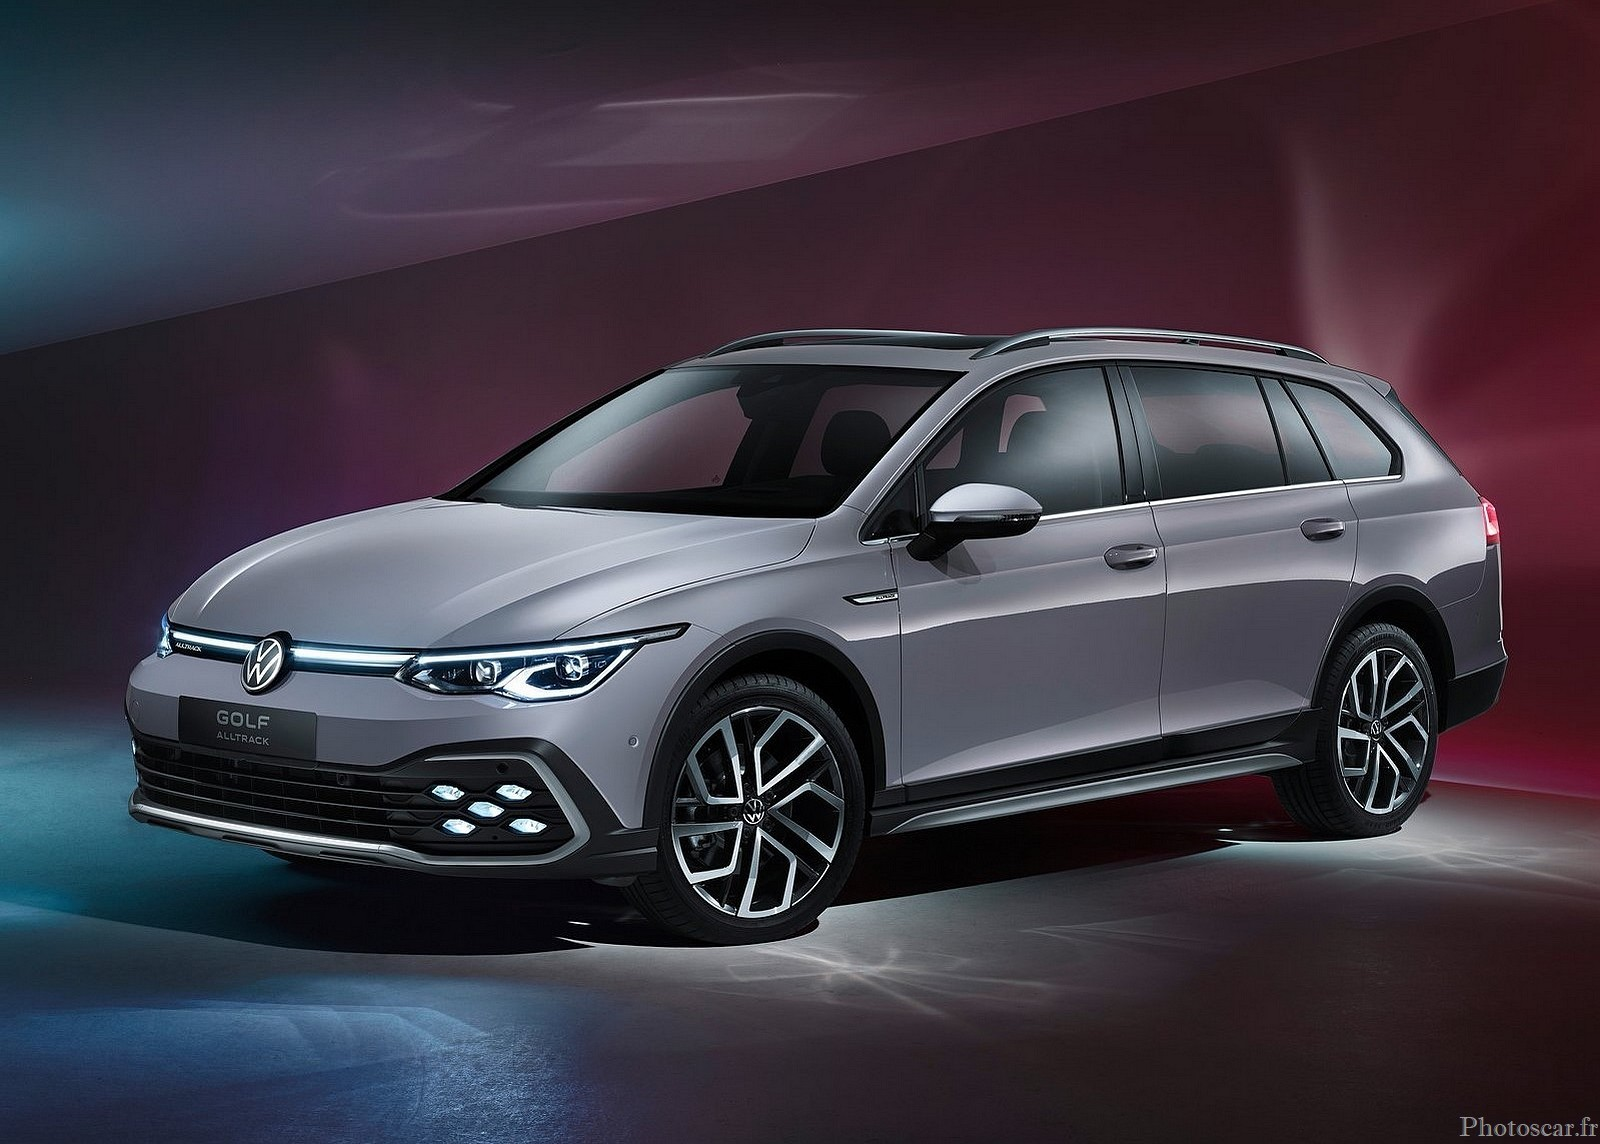 Volkswagen Golf Alltrack 2021